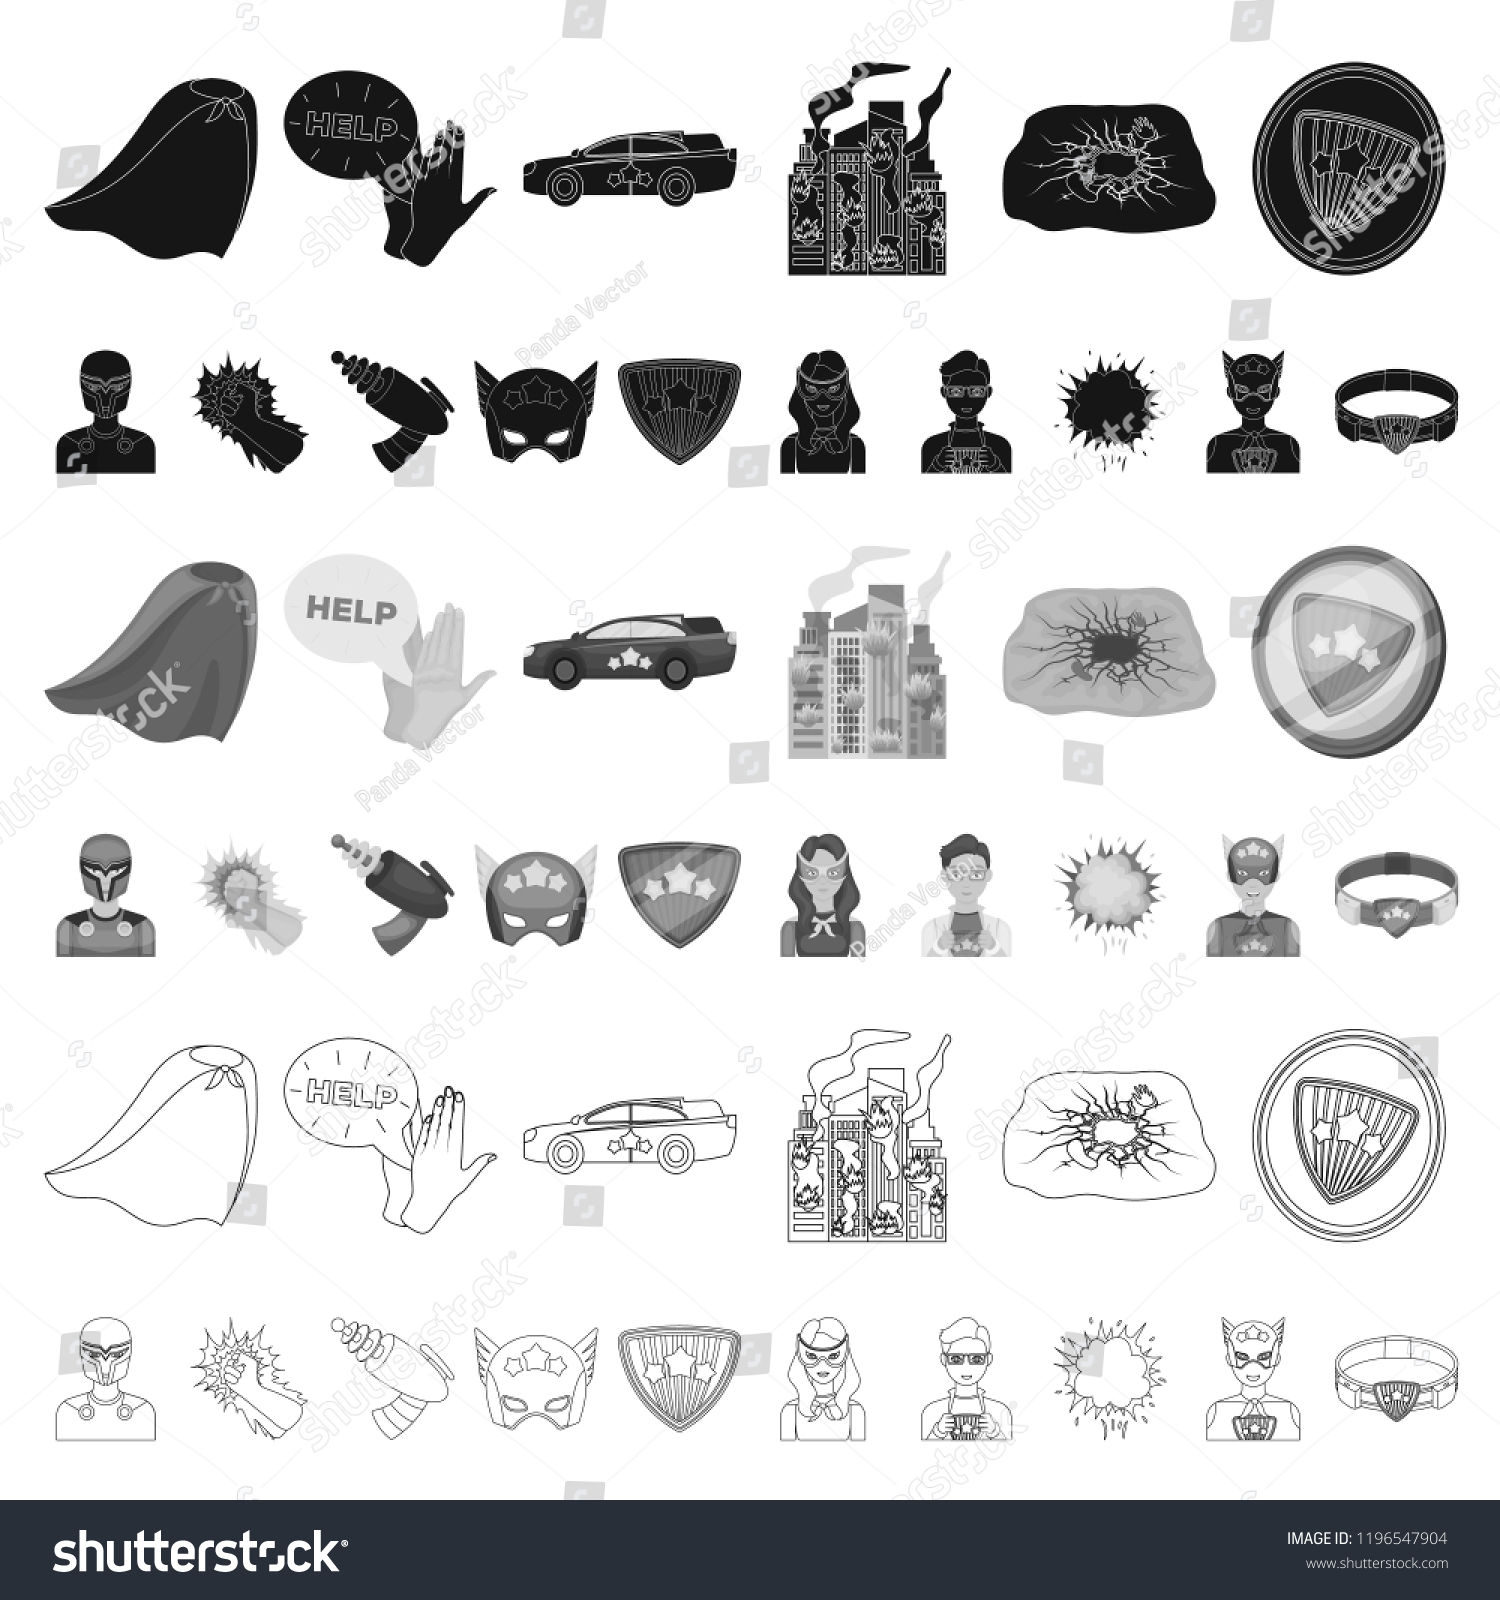 Fantastic Superhero Cartoon Icons Set Collection Stock Vector